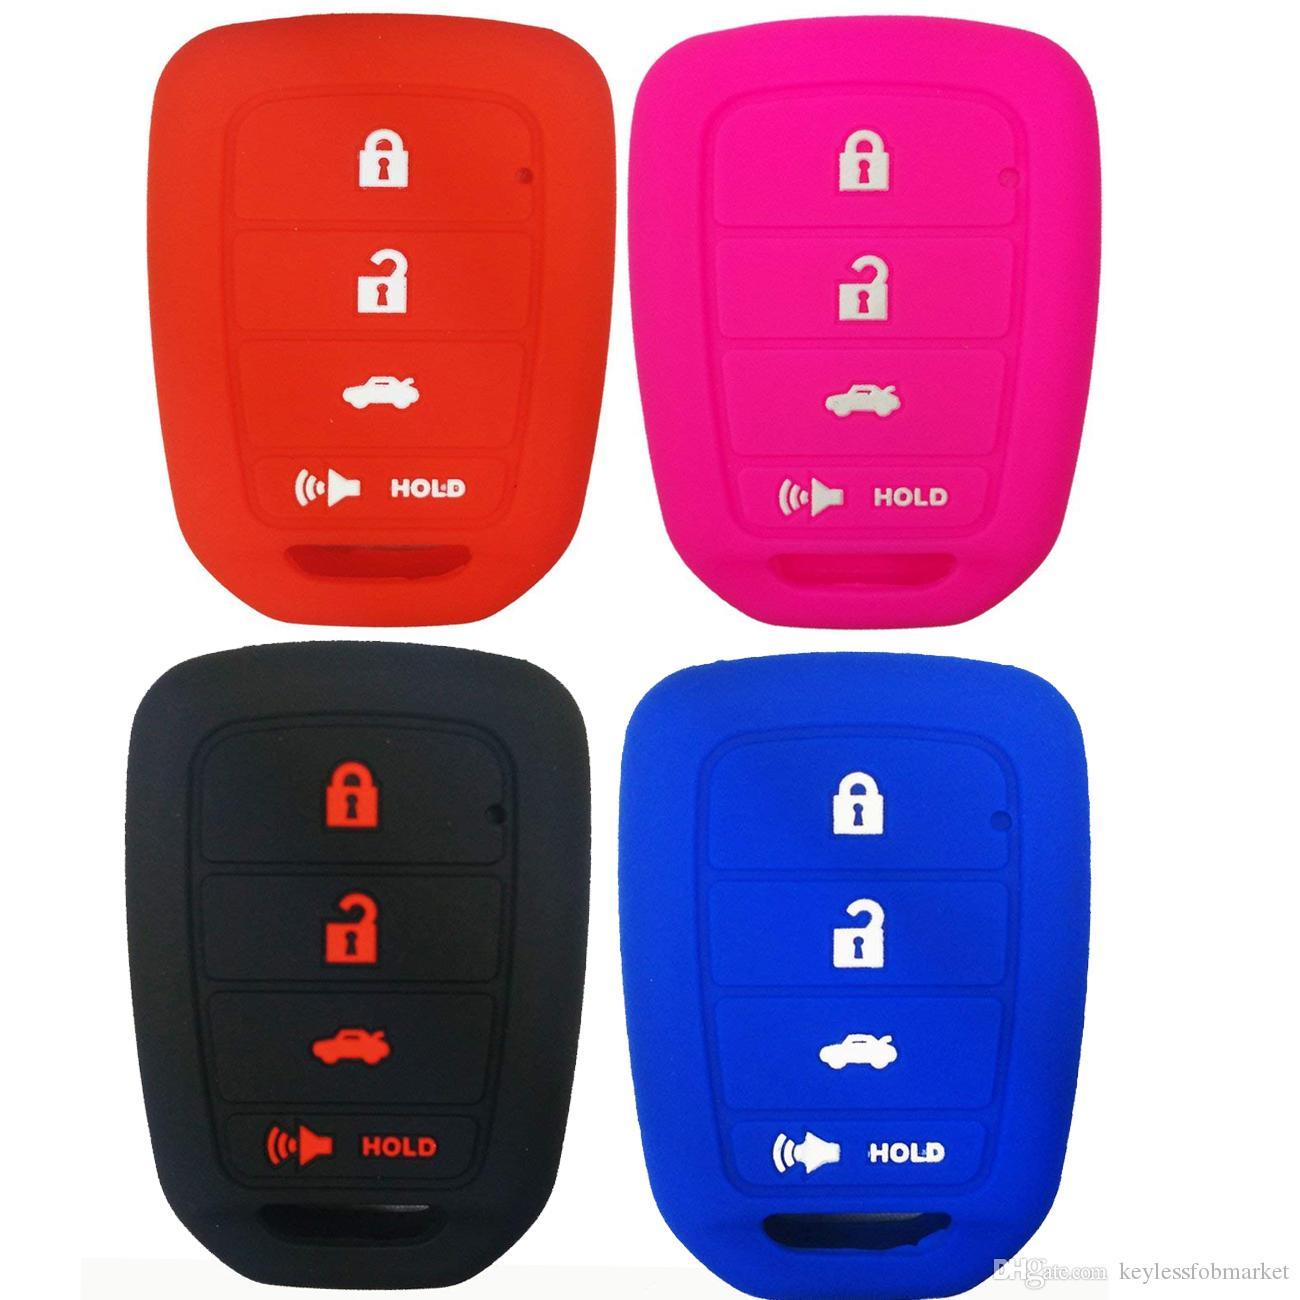 4 Buttons Silicone Car Key Cover Case Holder Shell FOR HONDA CR-V ACCORD CIVIC CRV JAZZ HR-V 2014 2015 2016 REMOTE KEY Protector